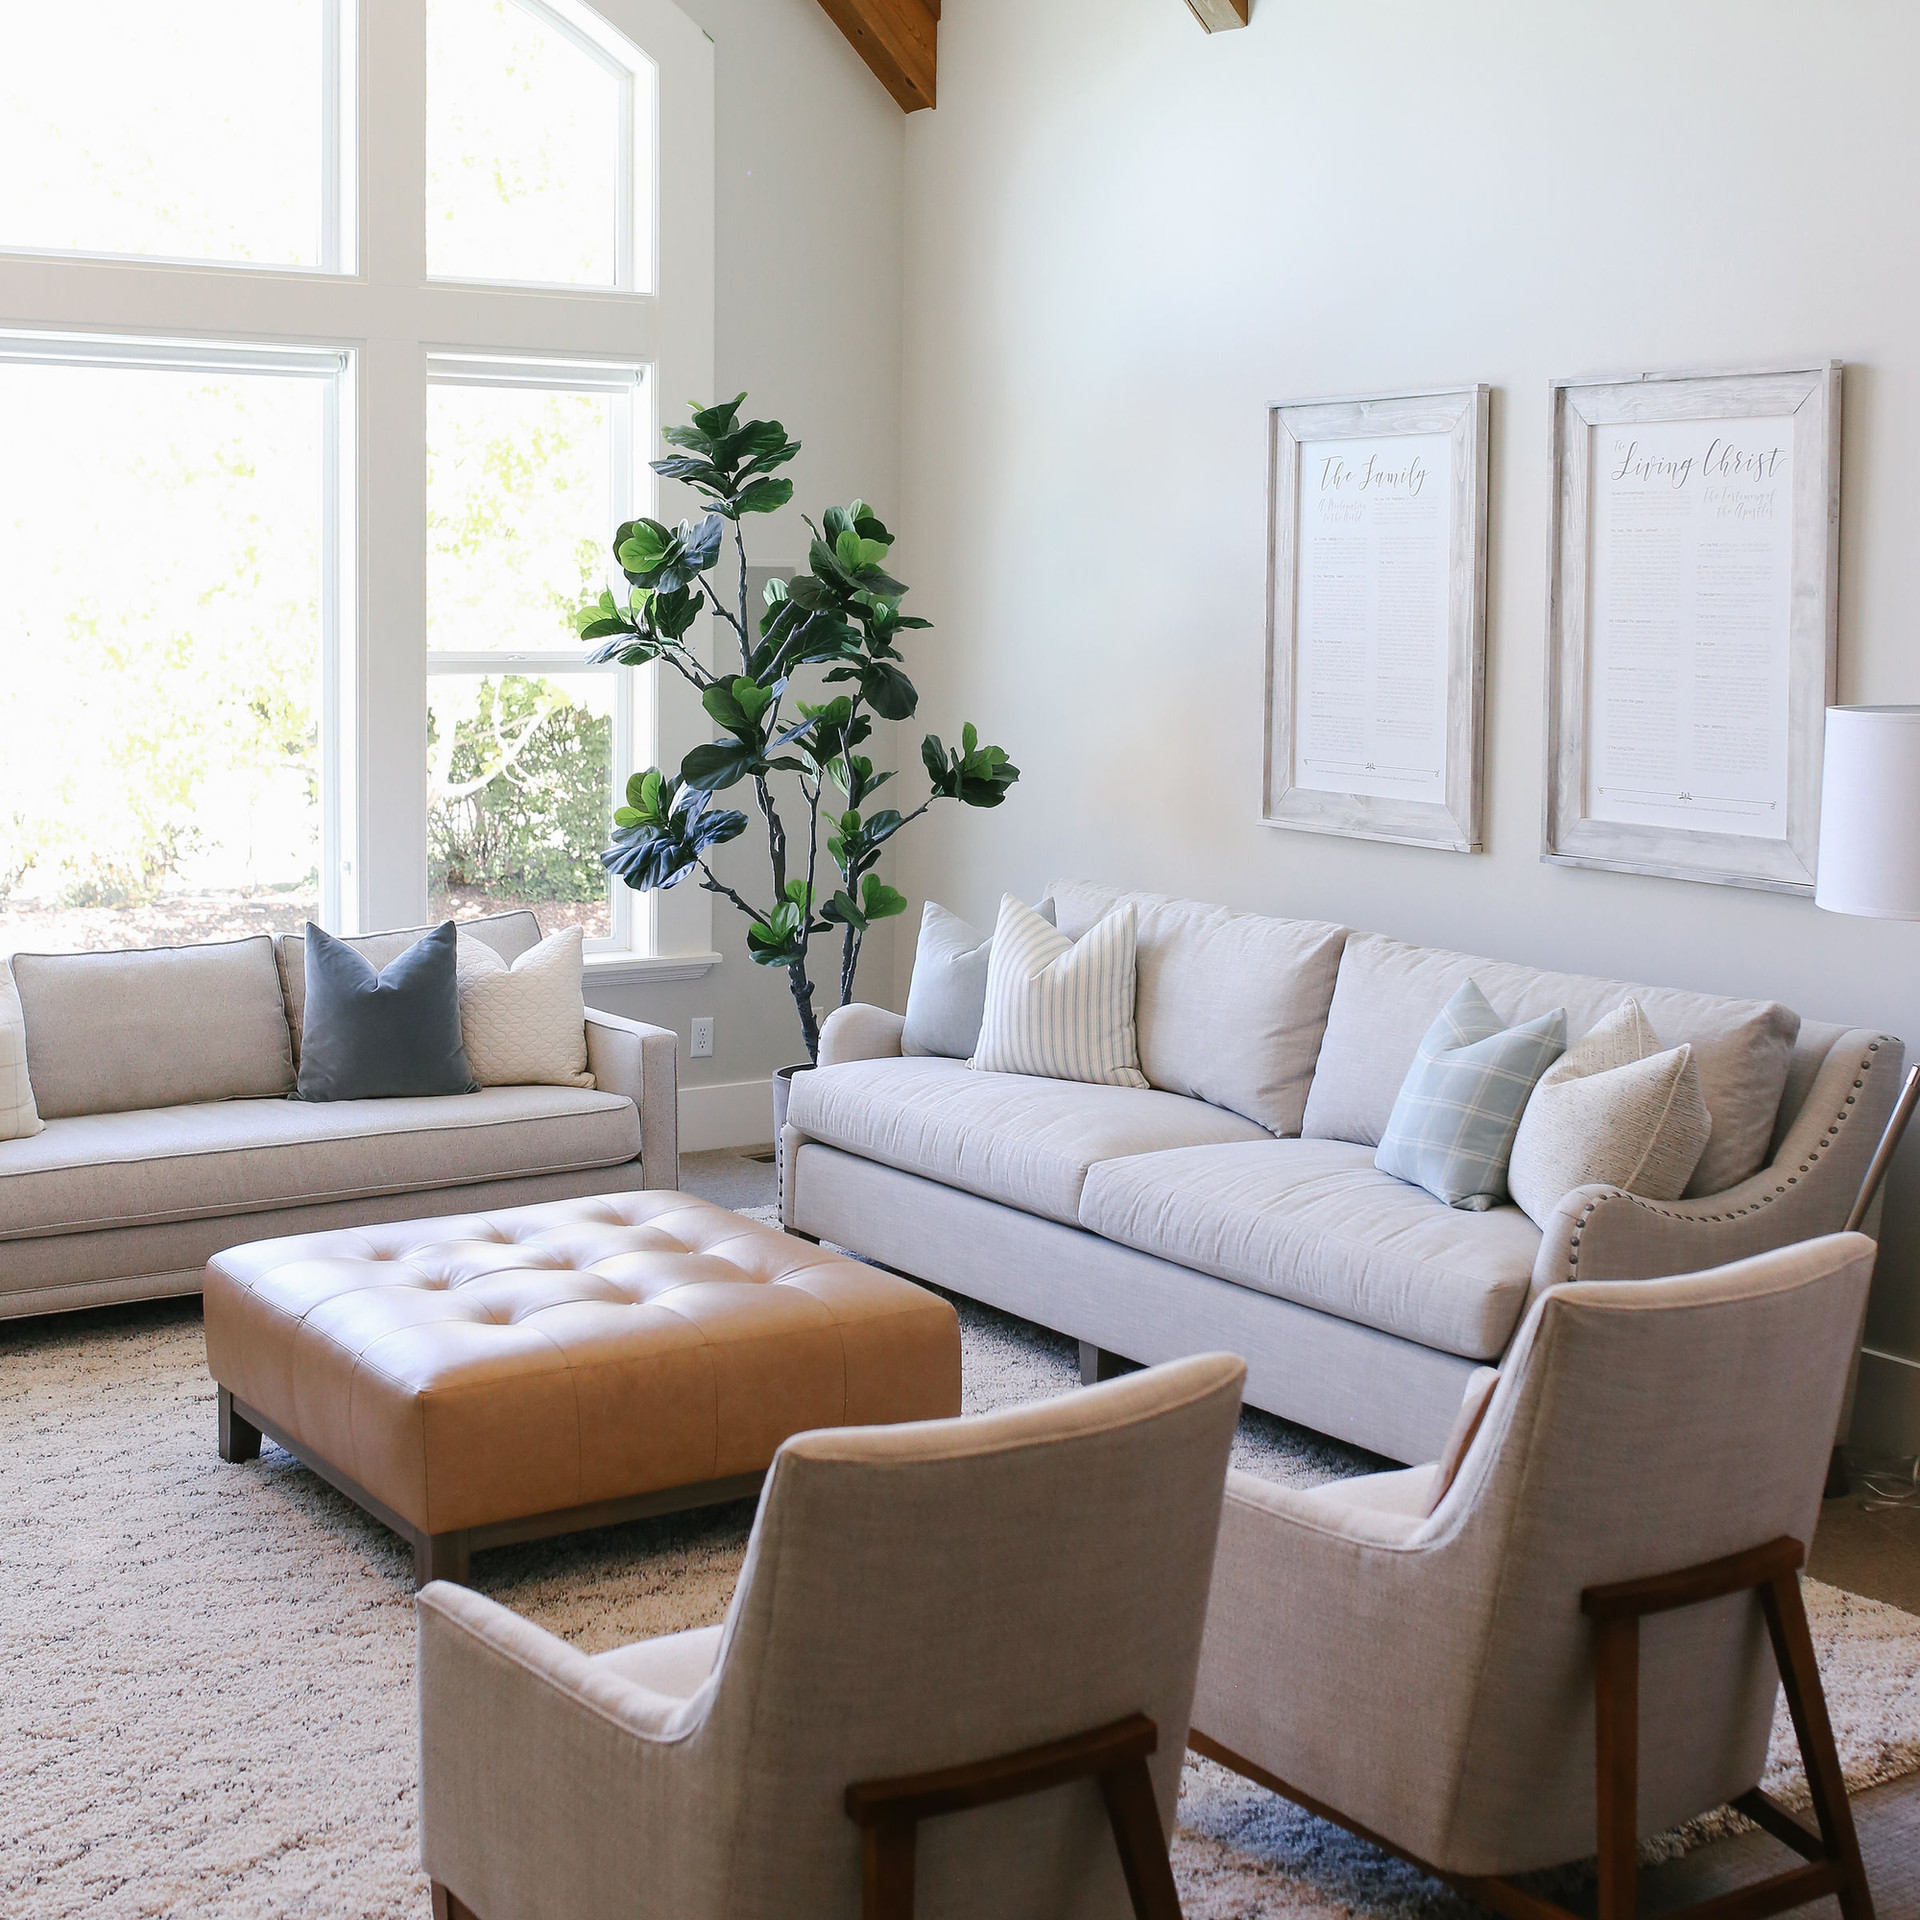 Anya's Decor: E&C Home